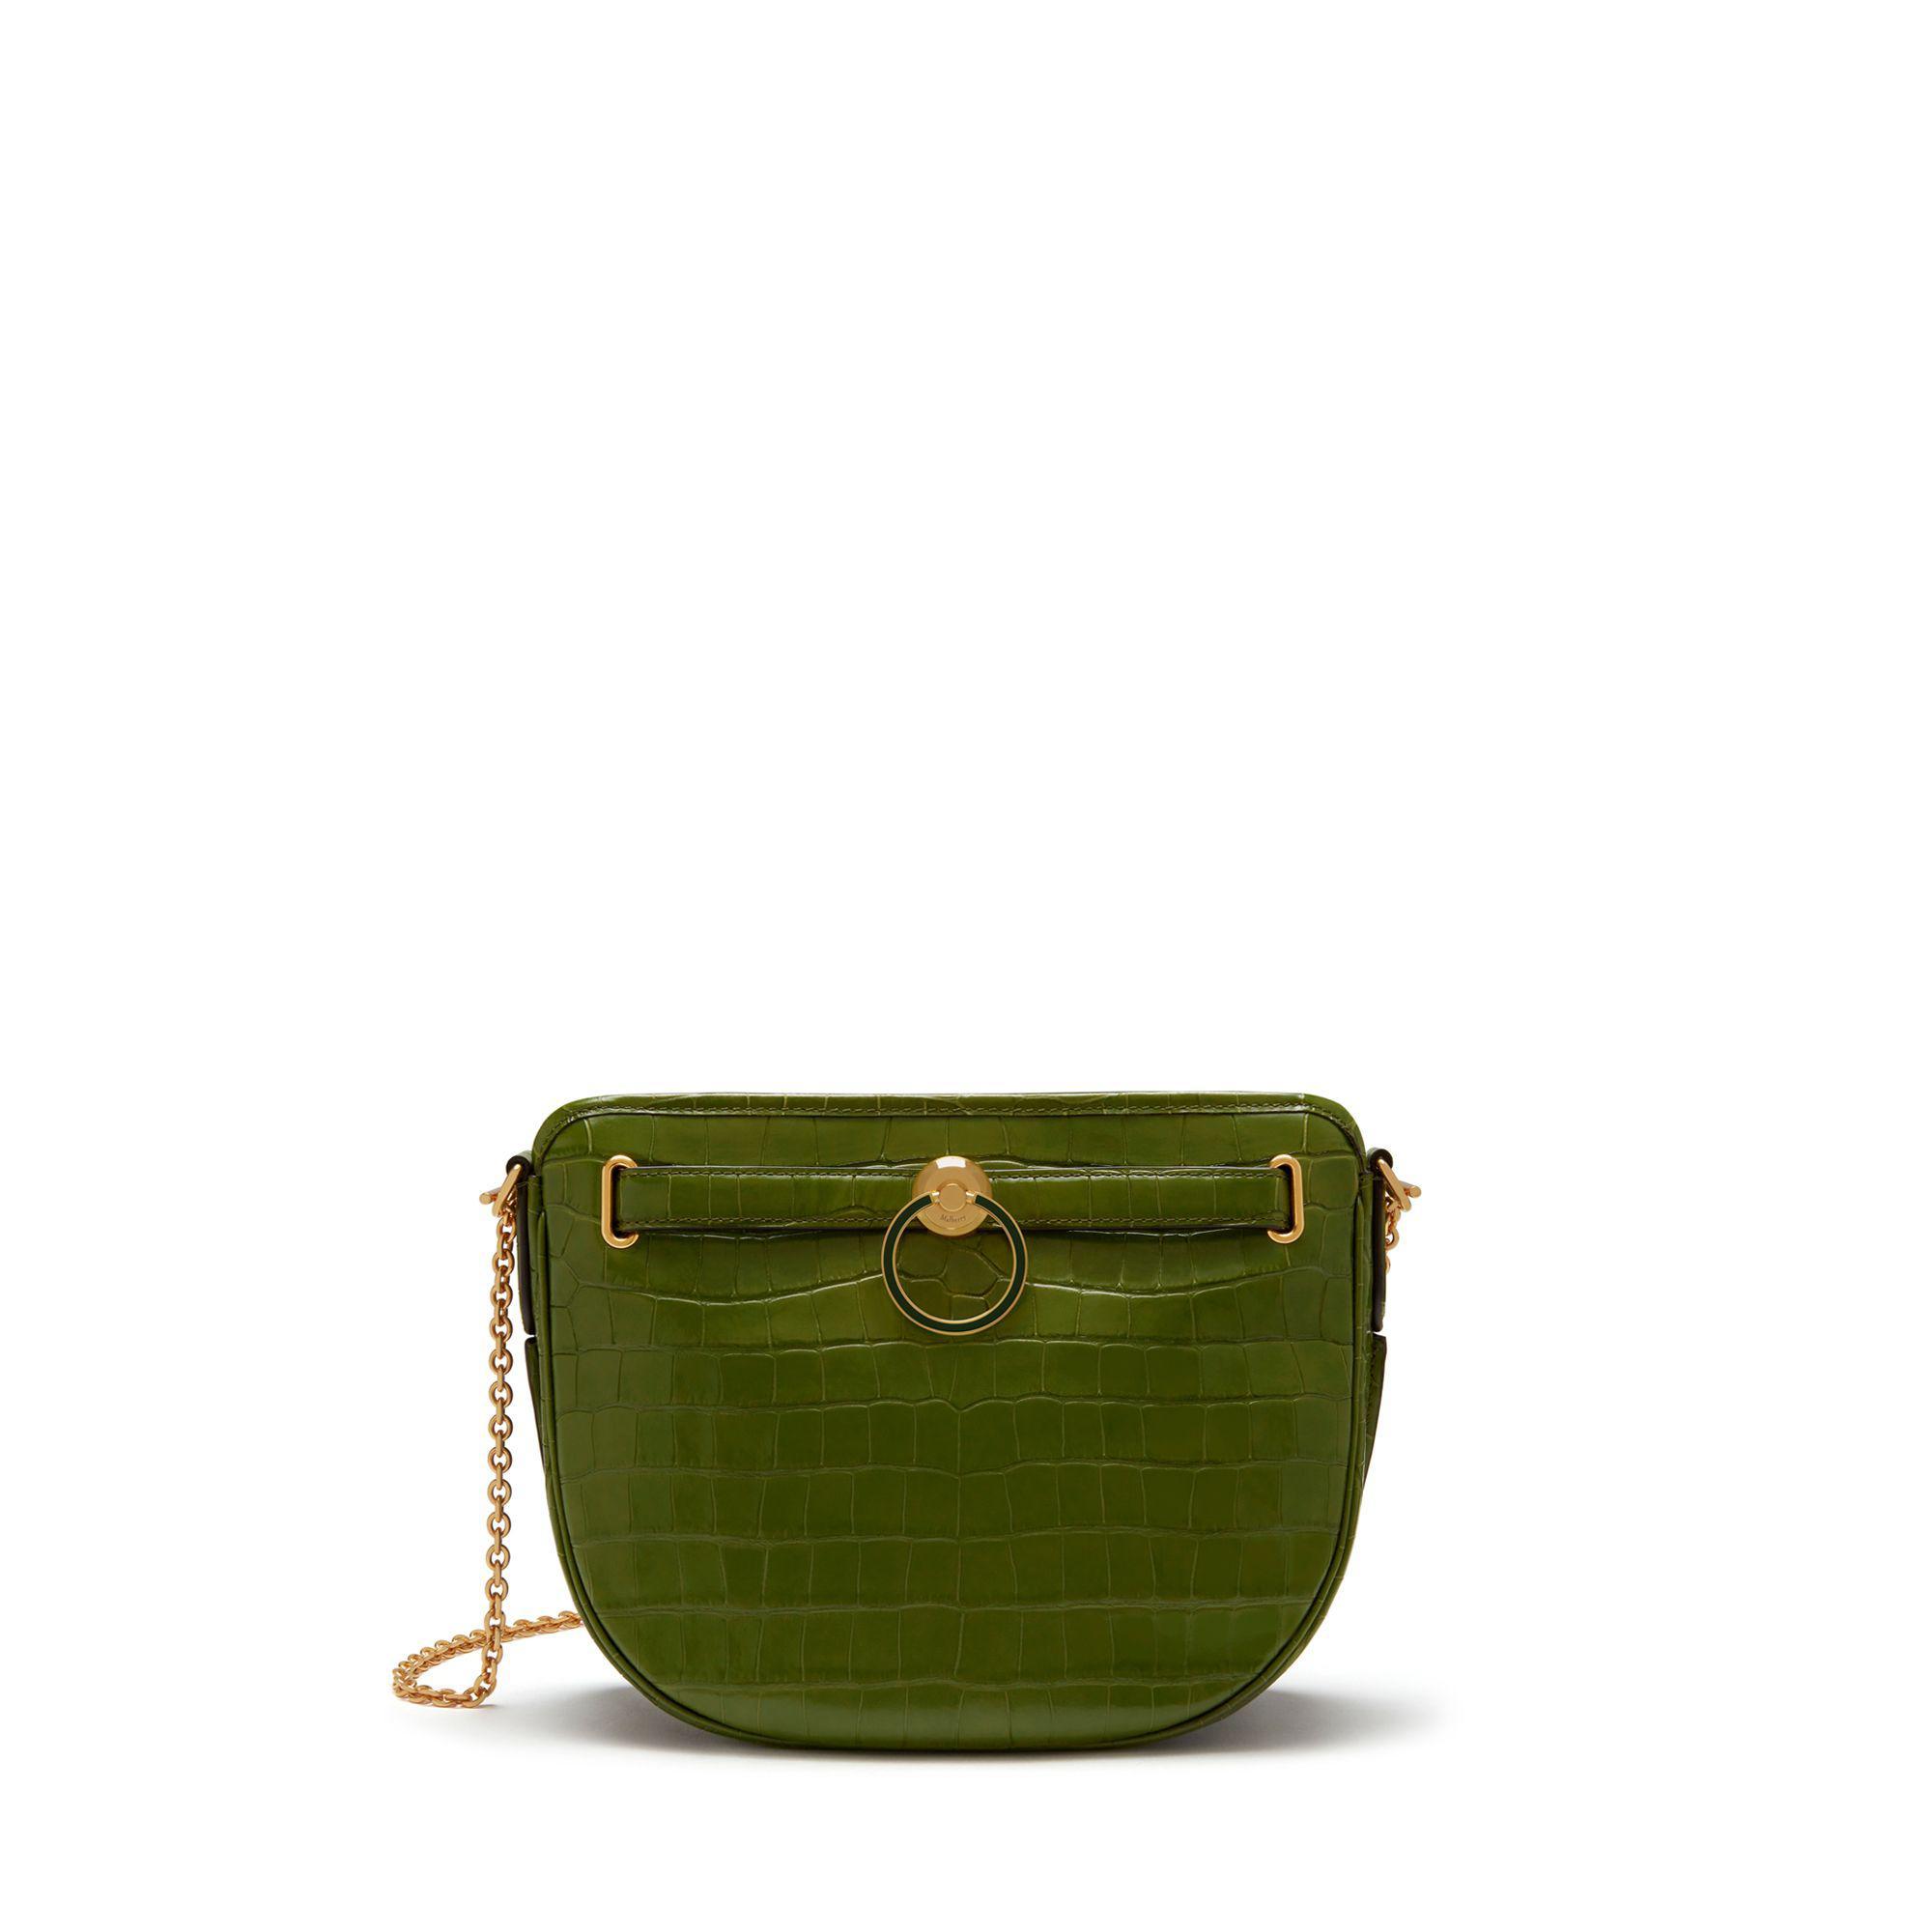 eb3b89e2f78b Lyst - Mulberry Brockwell In Dark Olive Croc Print in Green